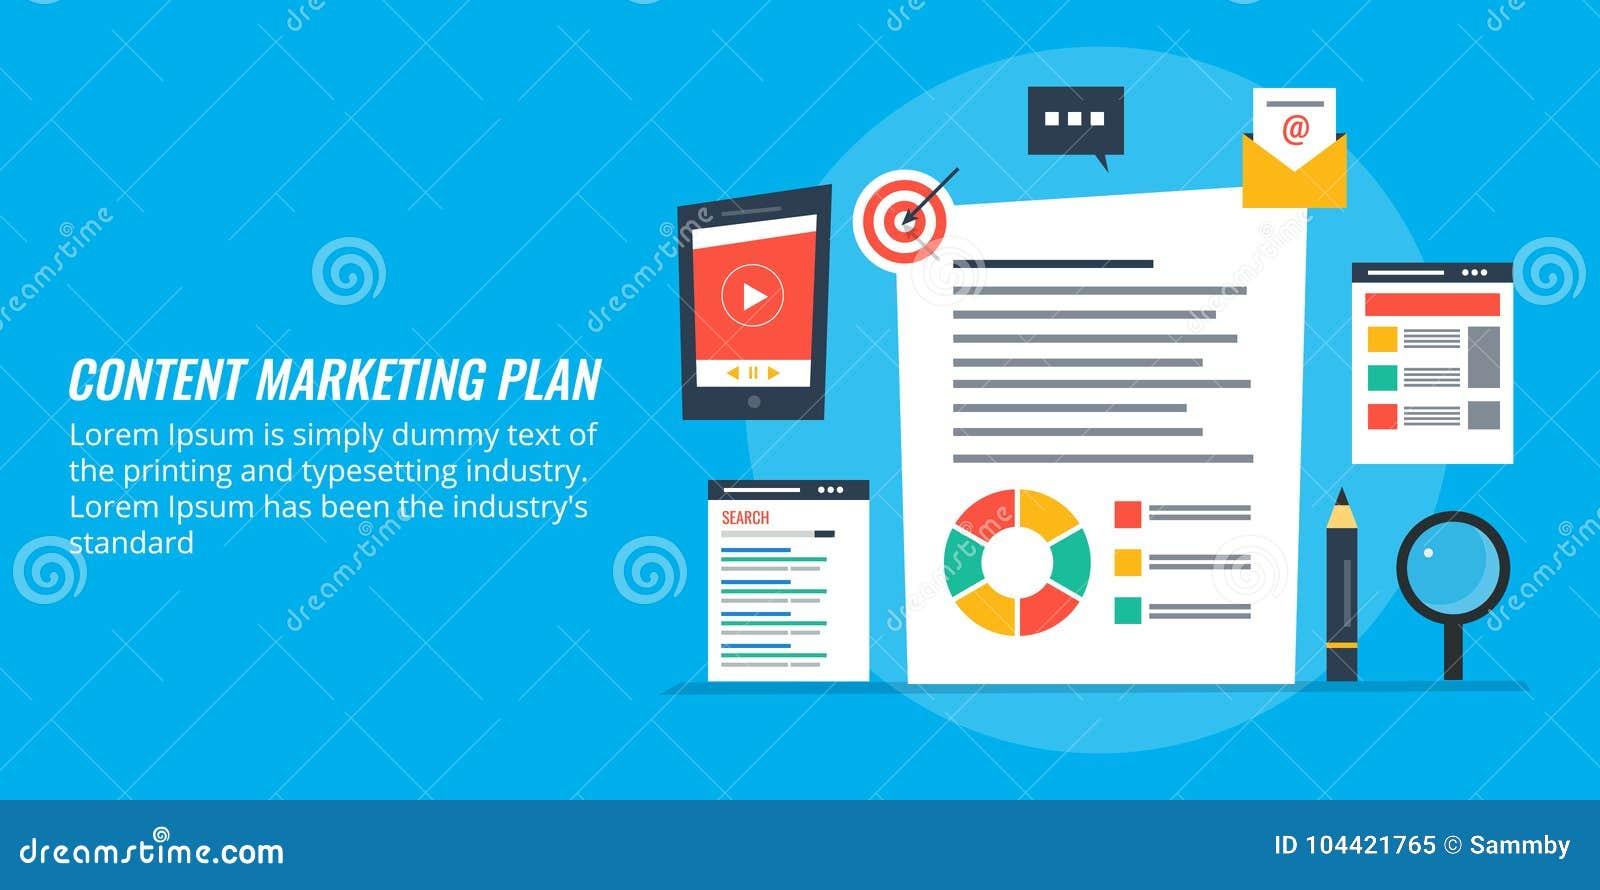 Inhoud marketing planning, bedrijfsbevorderingsstrategie via digitale inhoud